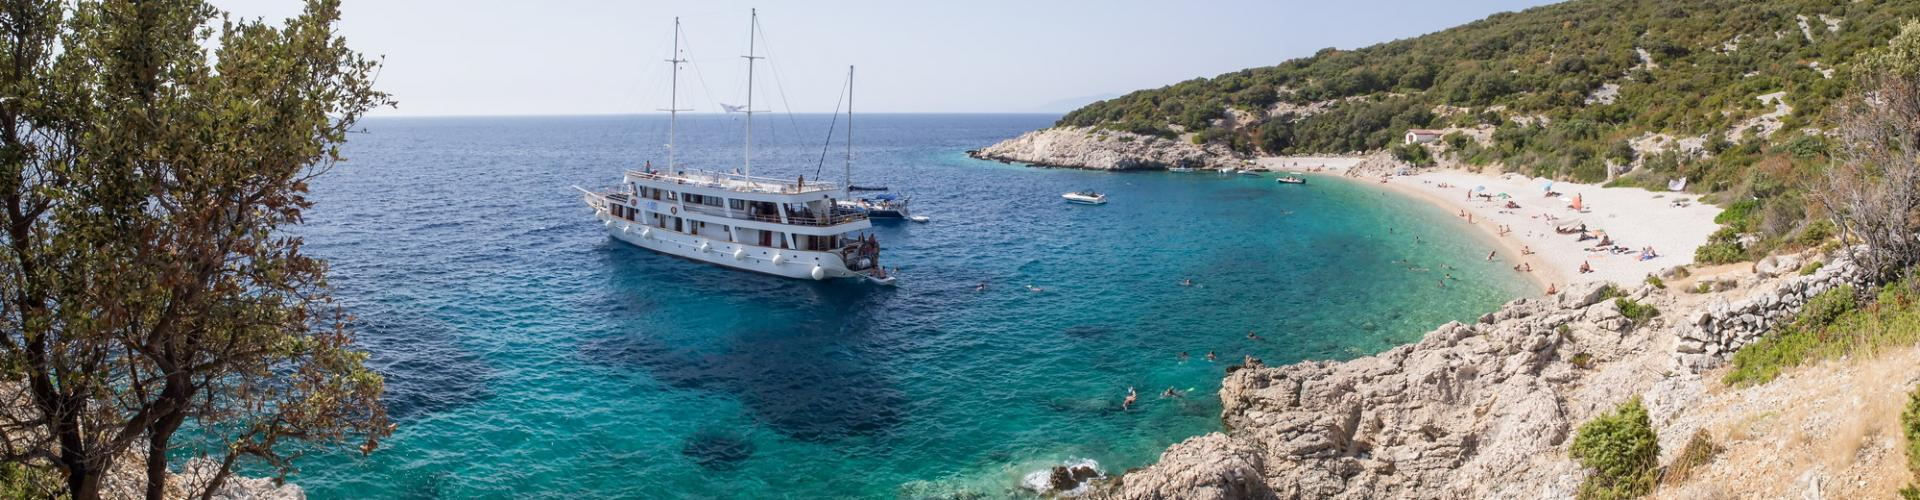 2011. Premium cruiser MV Dalmatia